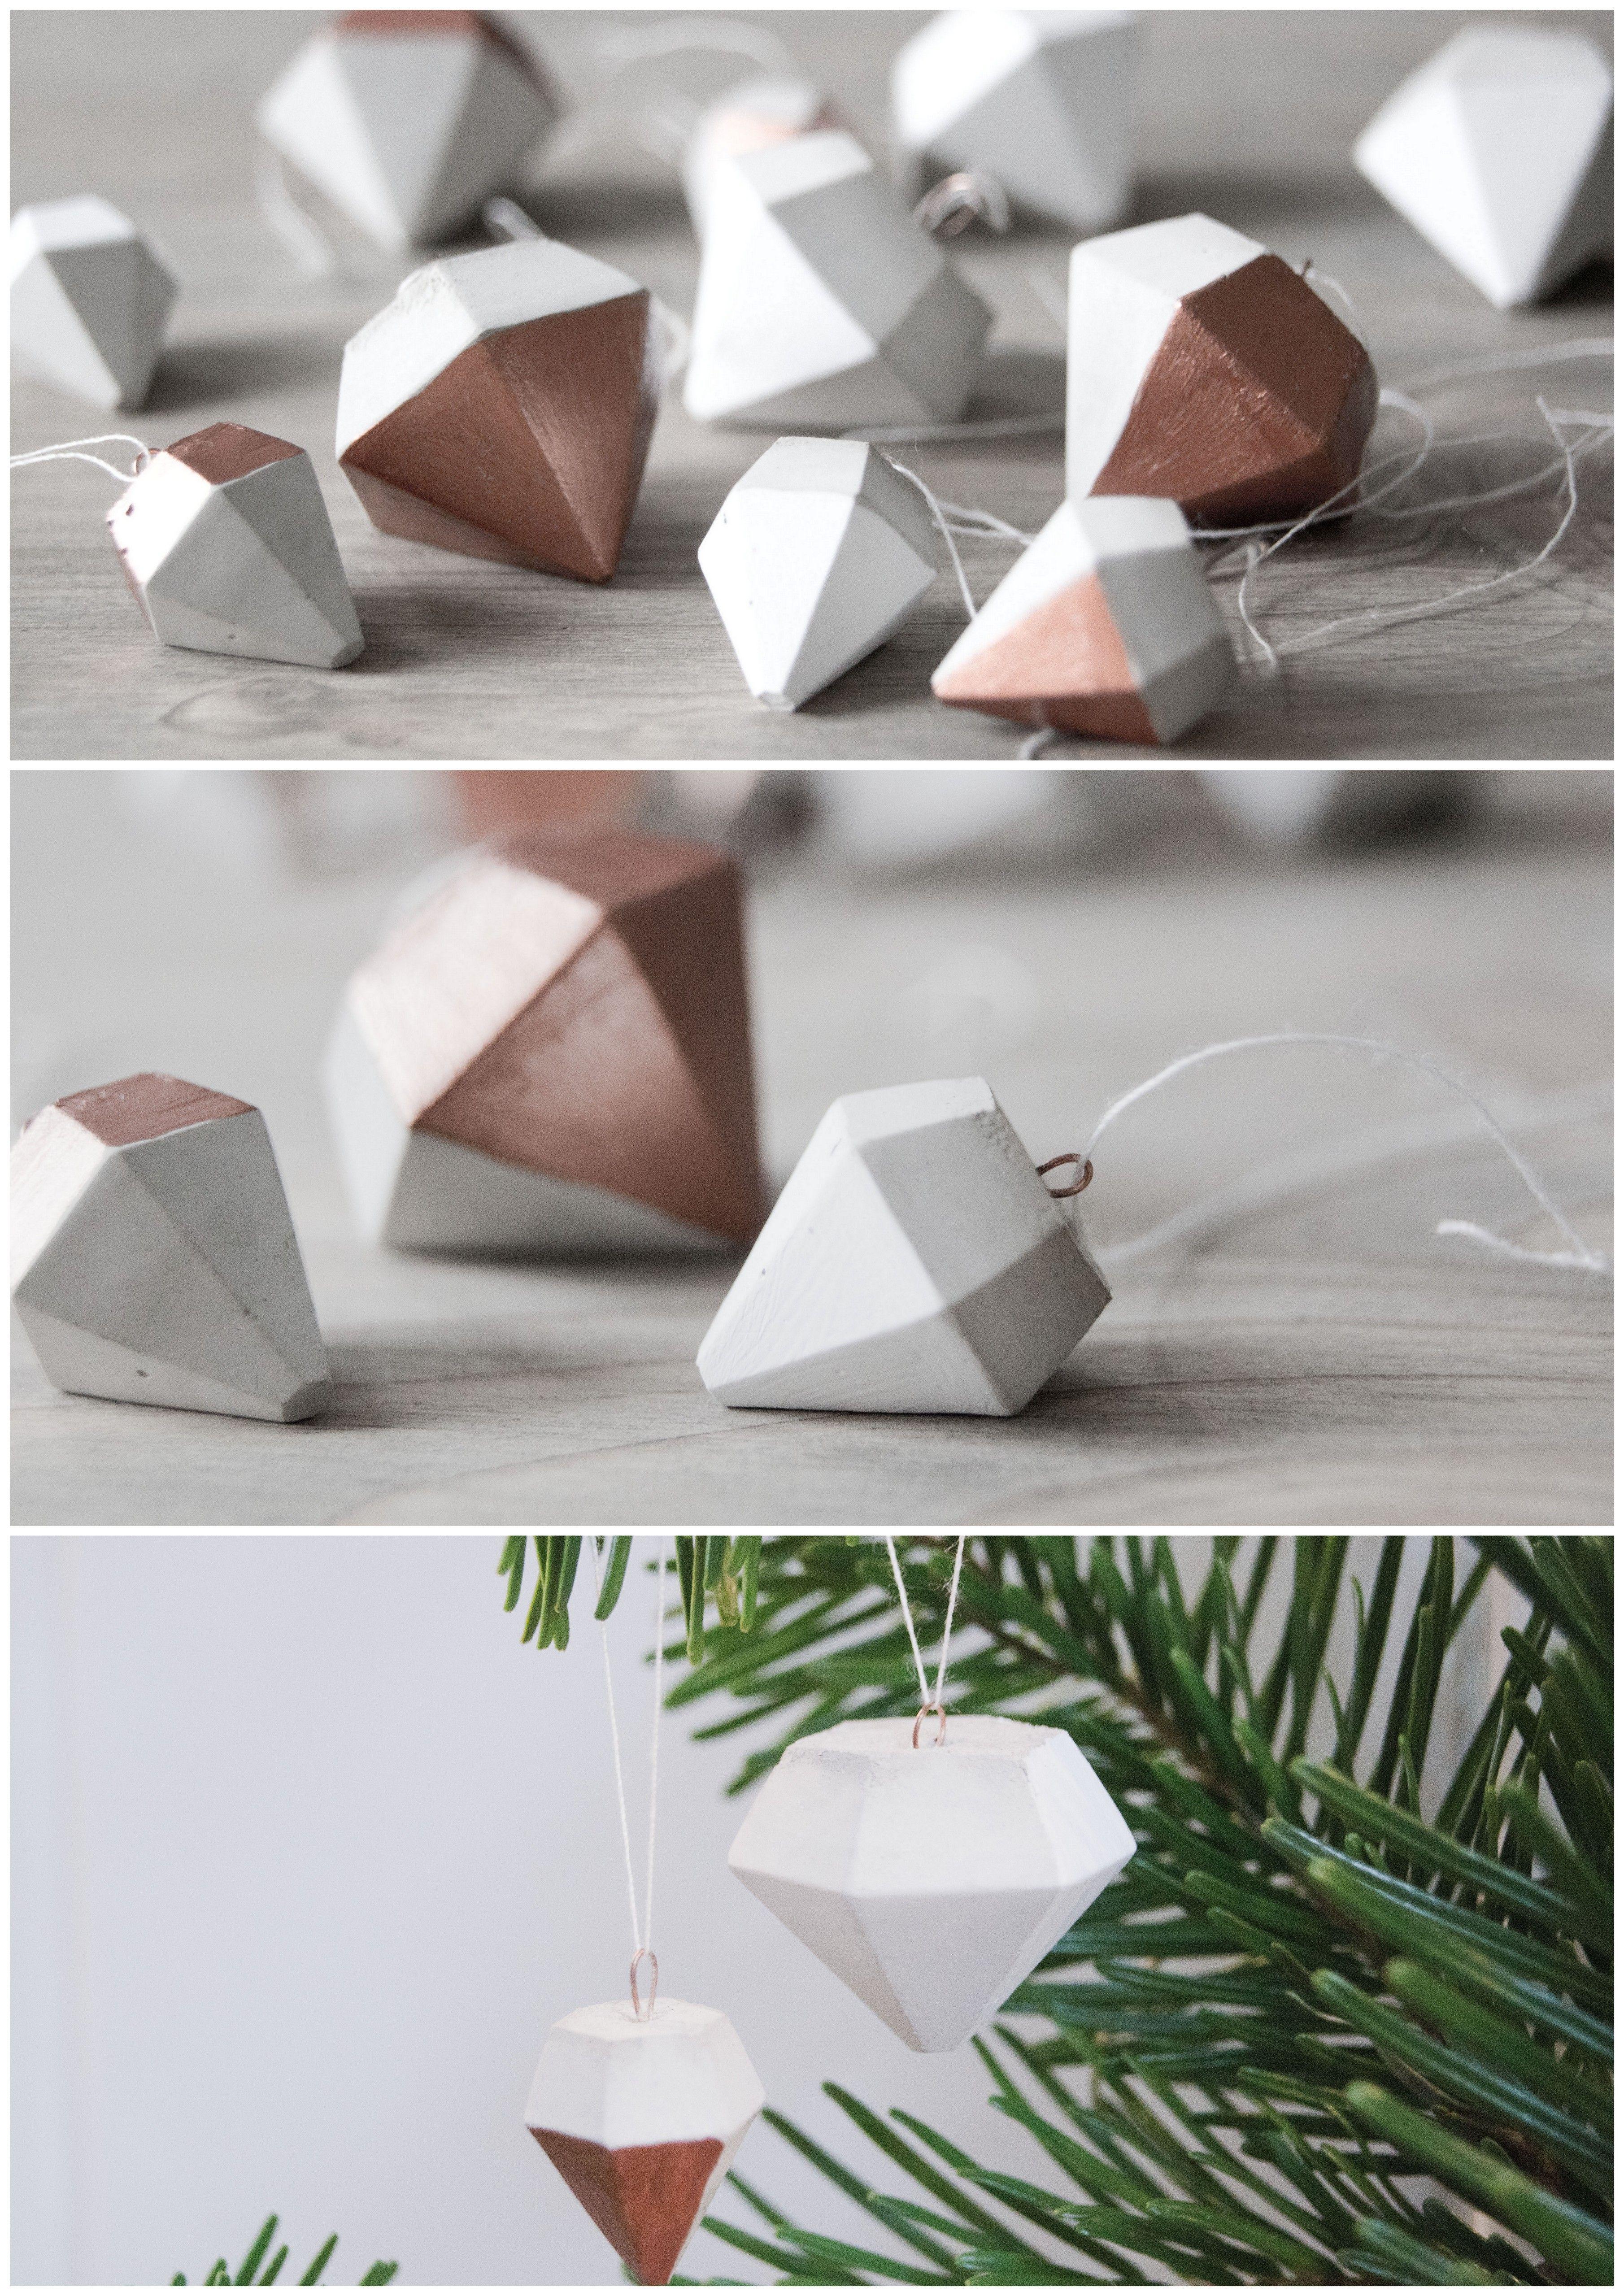 diy christbaum-diamant-hänger aus beton // diy concrete christmas